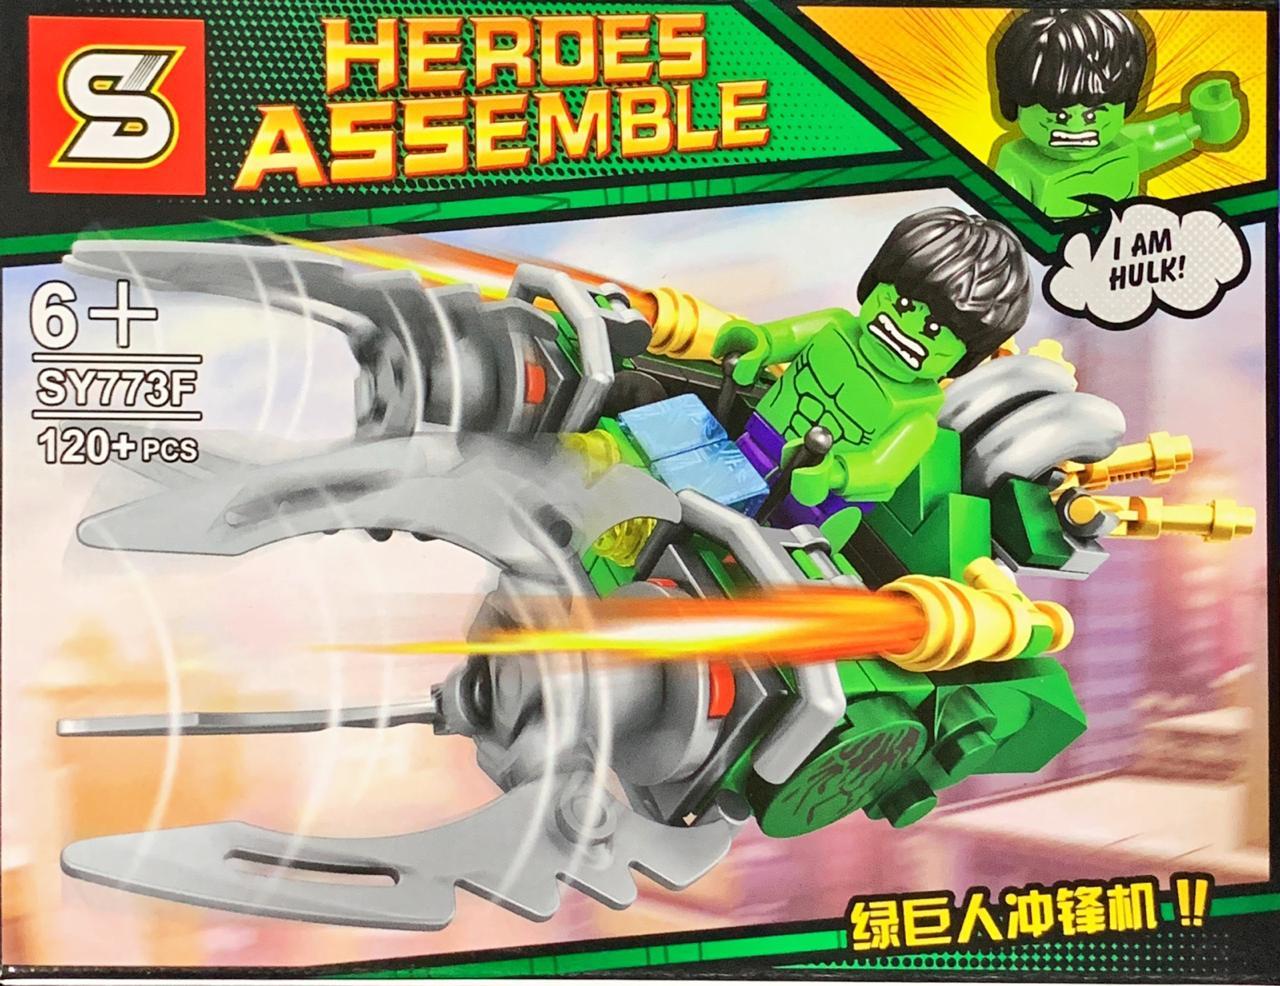 Bloco de Montar Heroes Assemble: Hulk (SY773F) - (120 Peças)